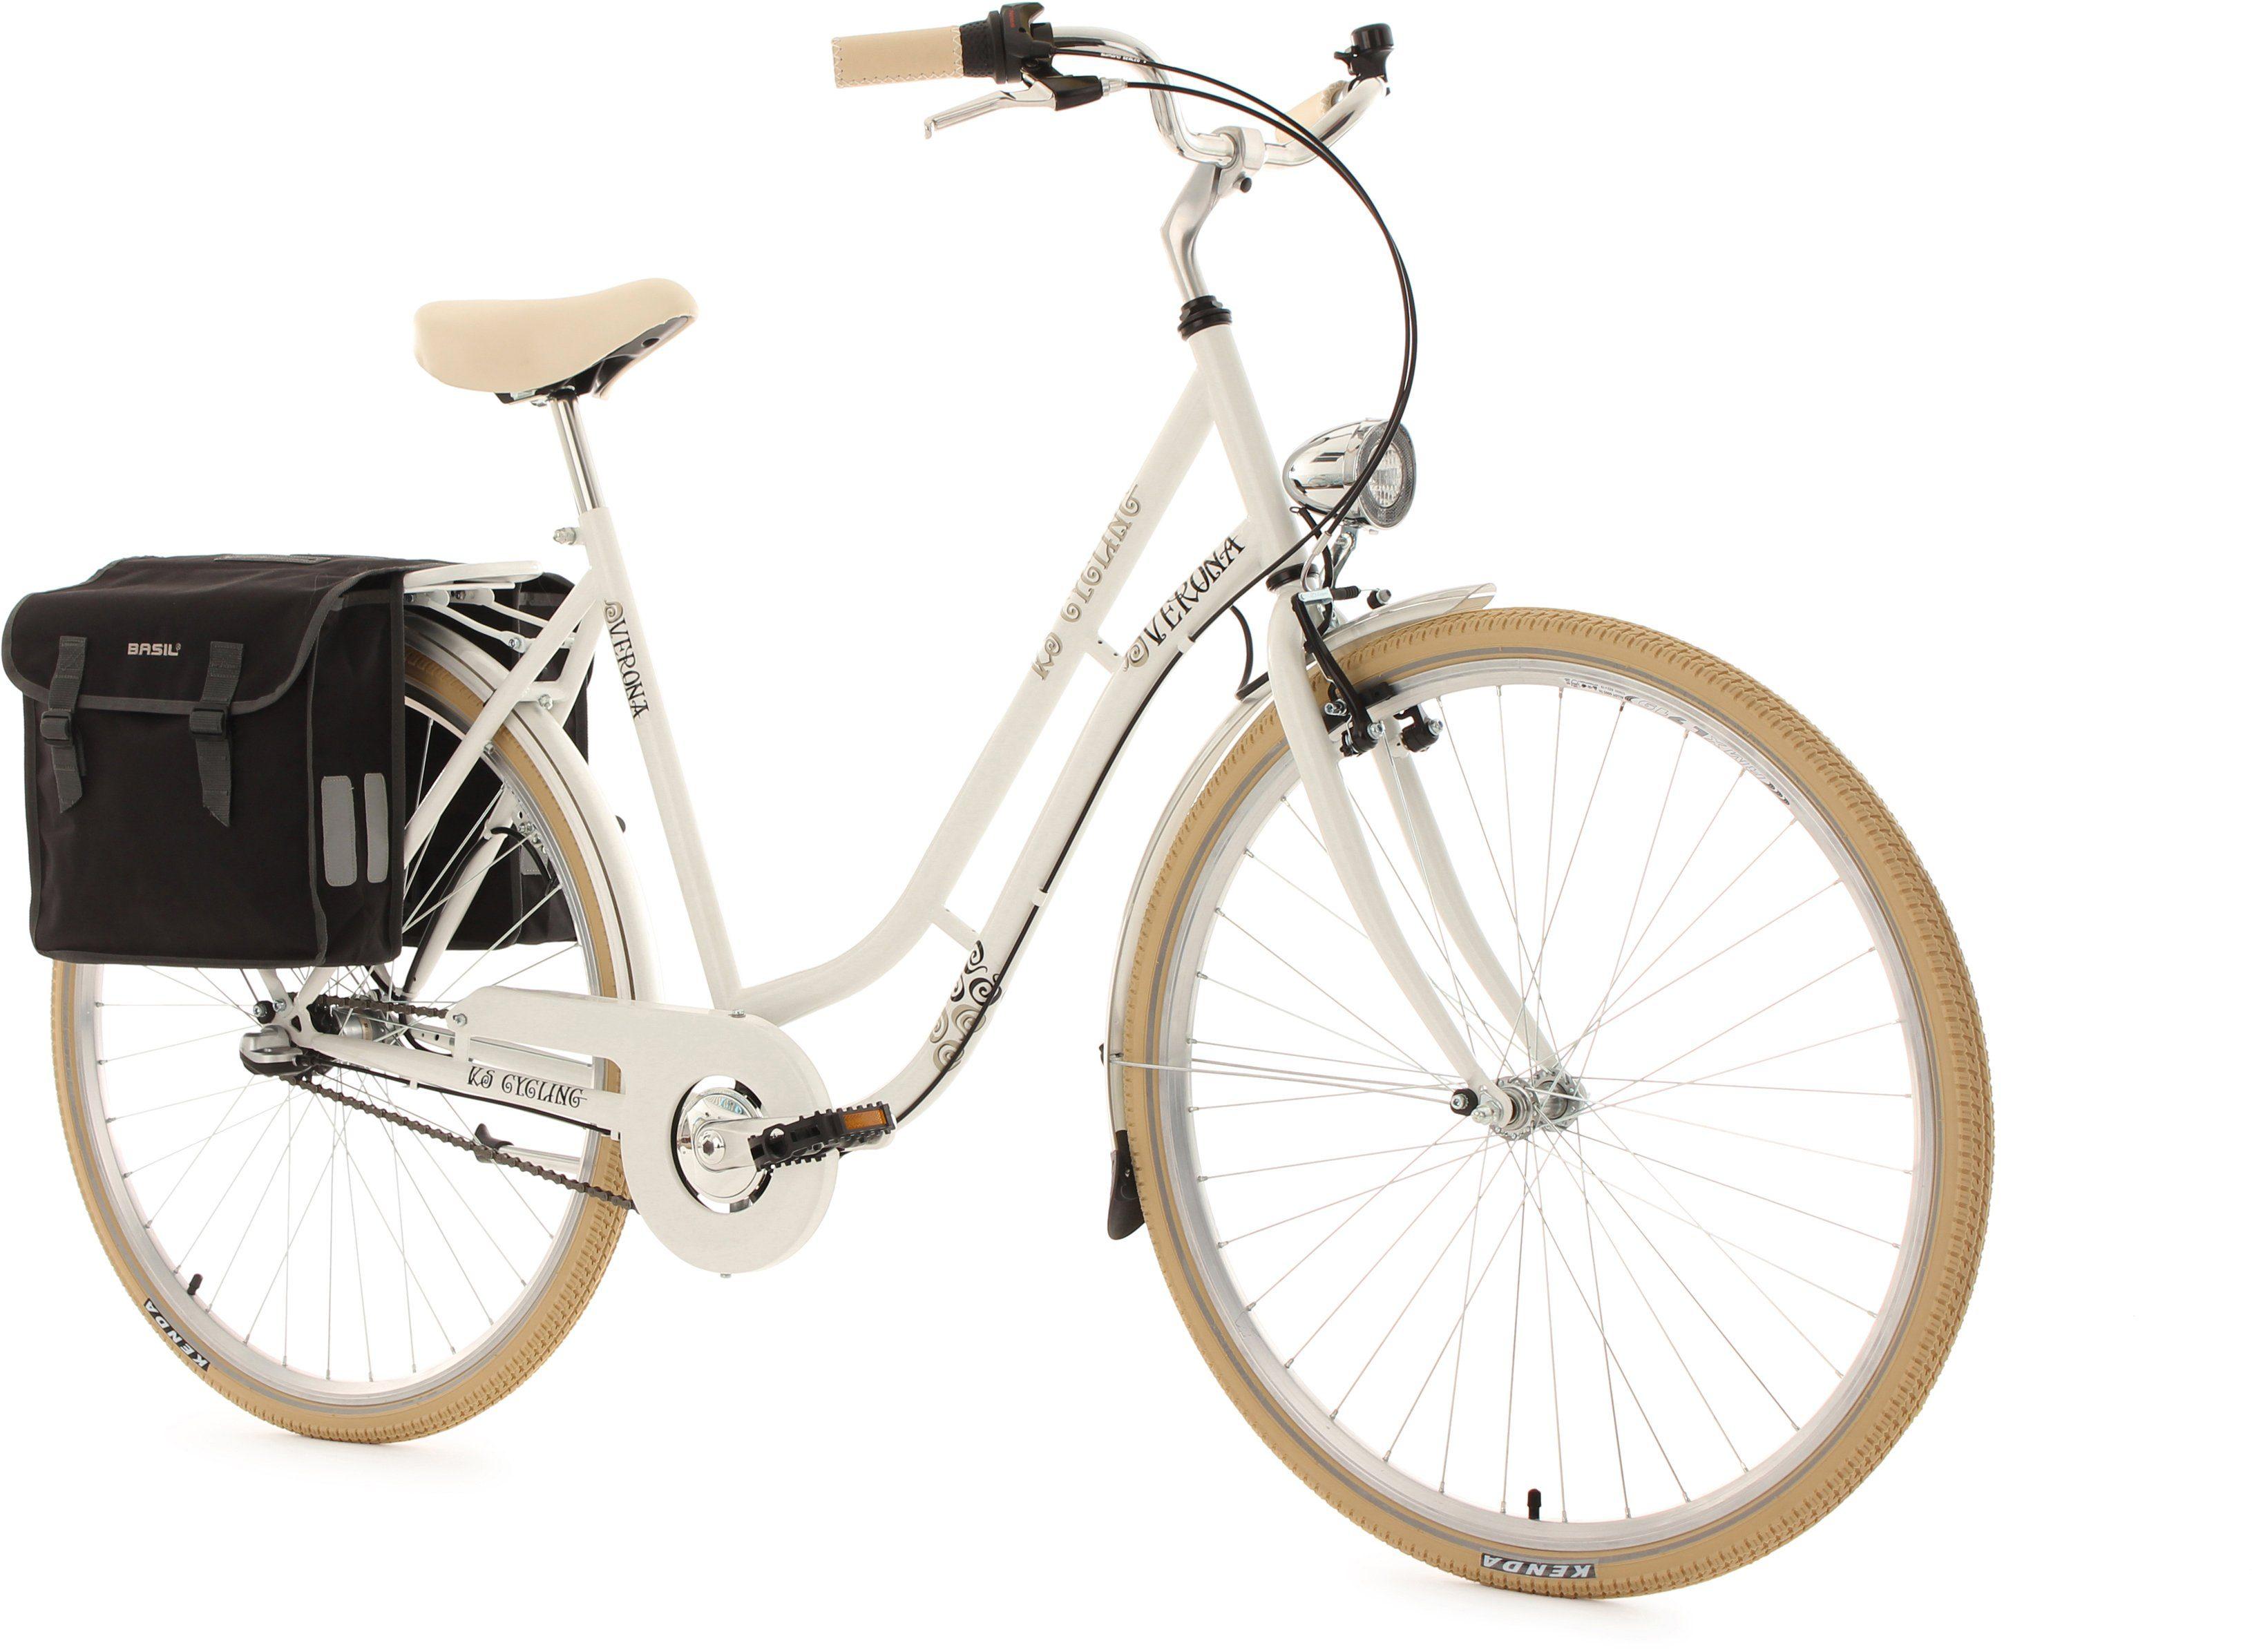 KS Cycling Damen-Cityrad, 28 Zoll, weiß, 3 Gang Shimano Nexus, inkl. Doppelpacktasche, »Verona«